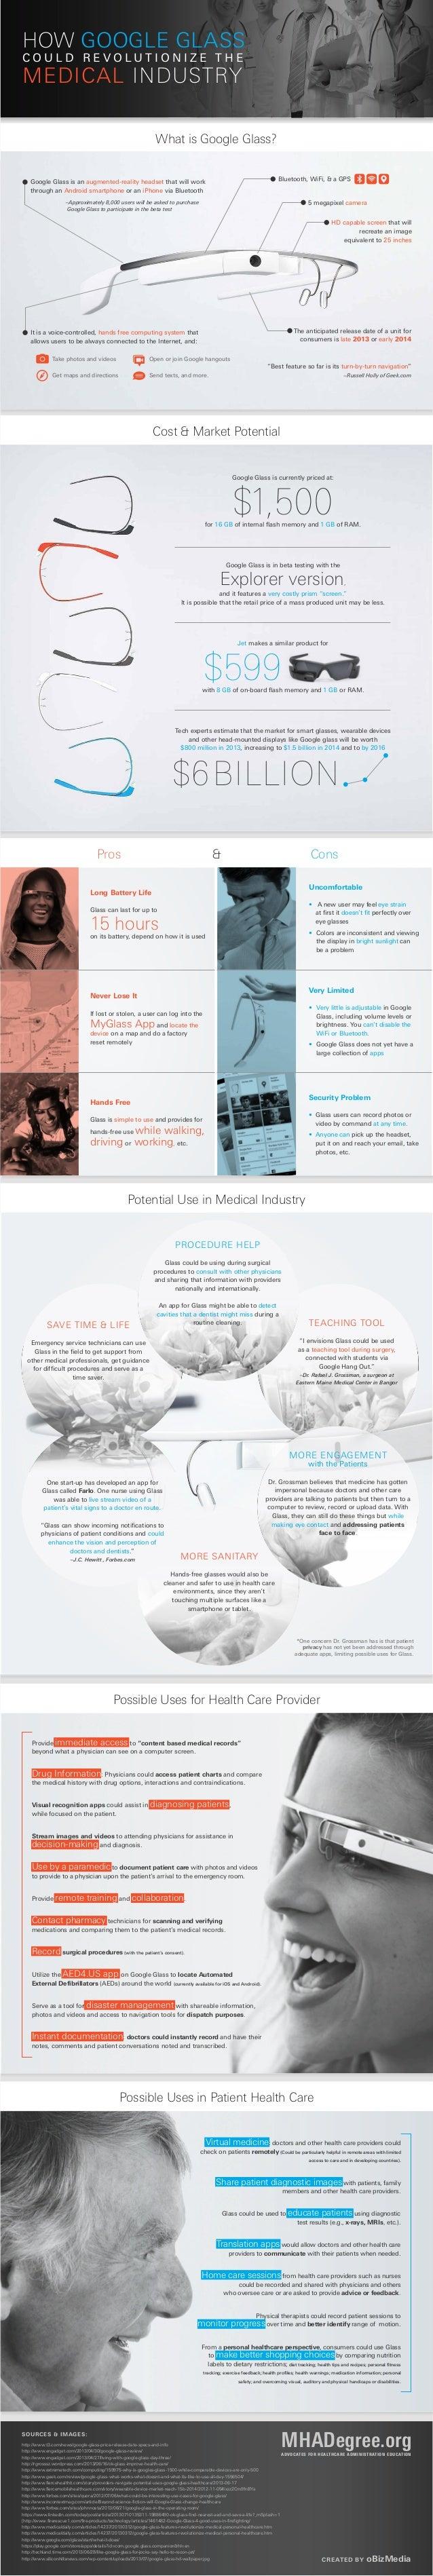 http://www.t3.com/news/google-glass-price-release-date-specs-and-info http://www.engadget.com/2013/04/30/google-glass-revi...